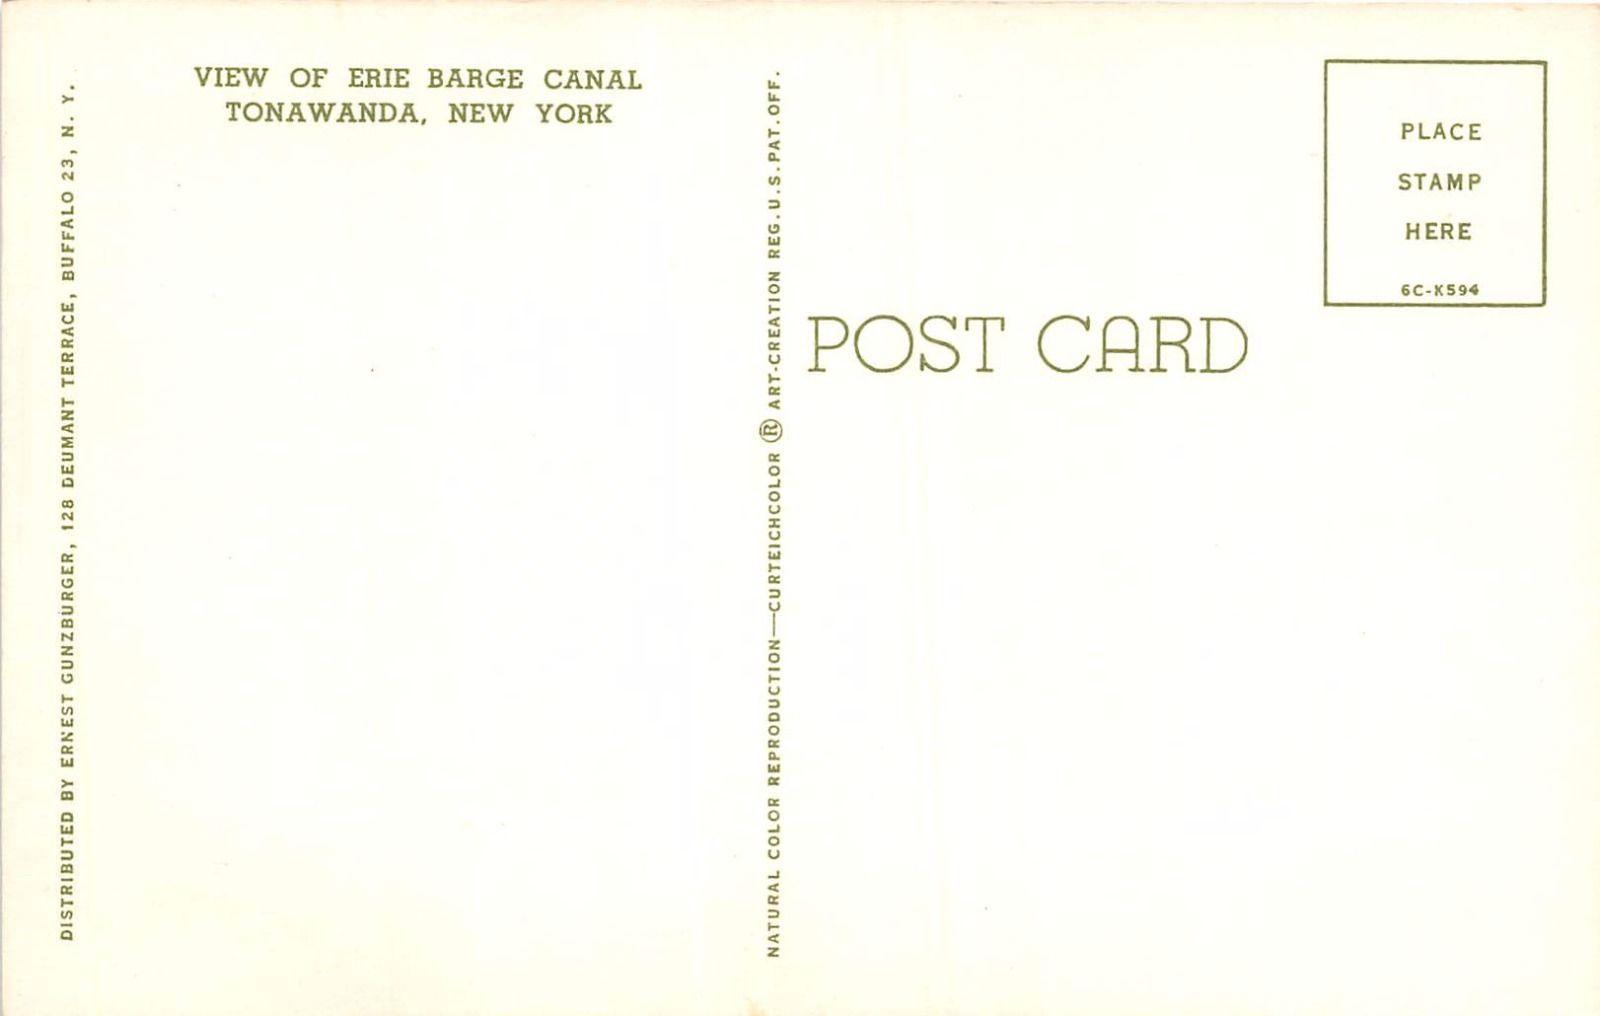 Erie Barge Canal, postcard back (c1960).jpg